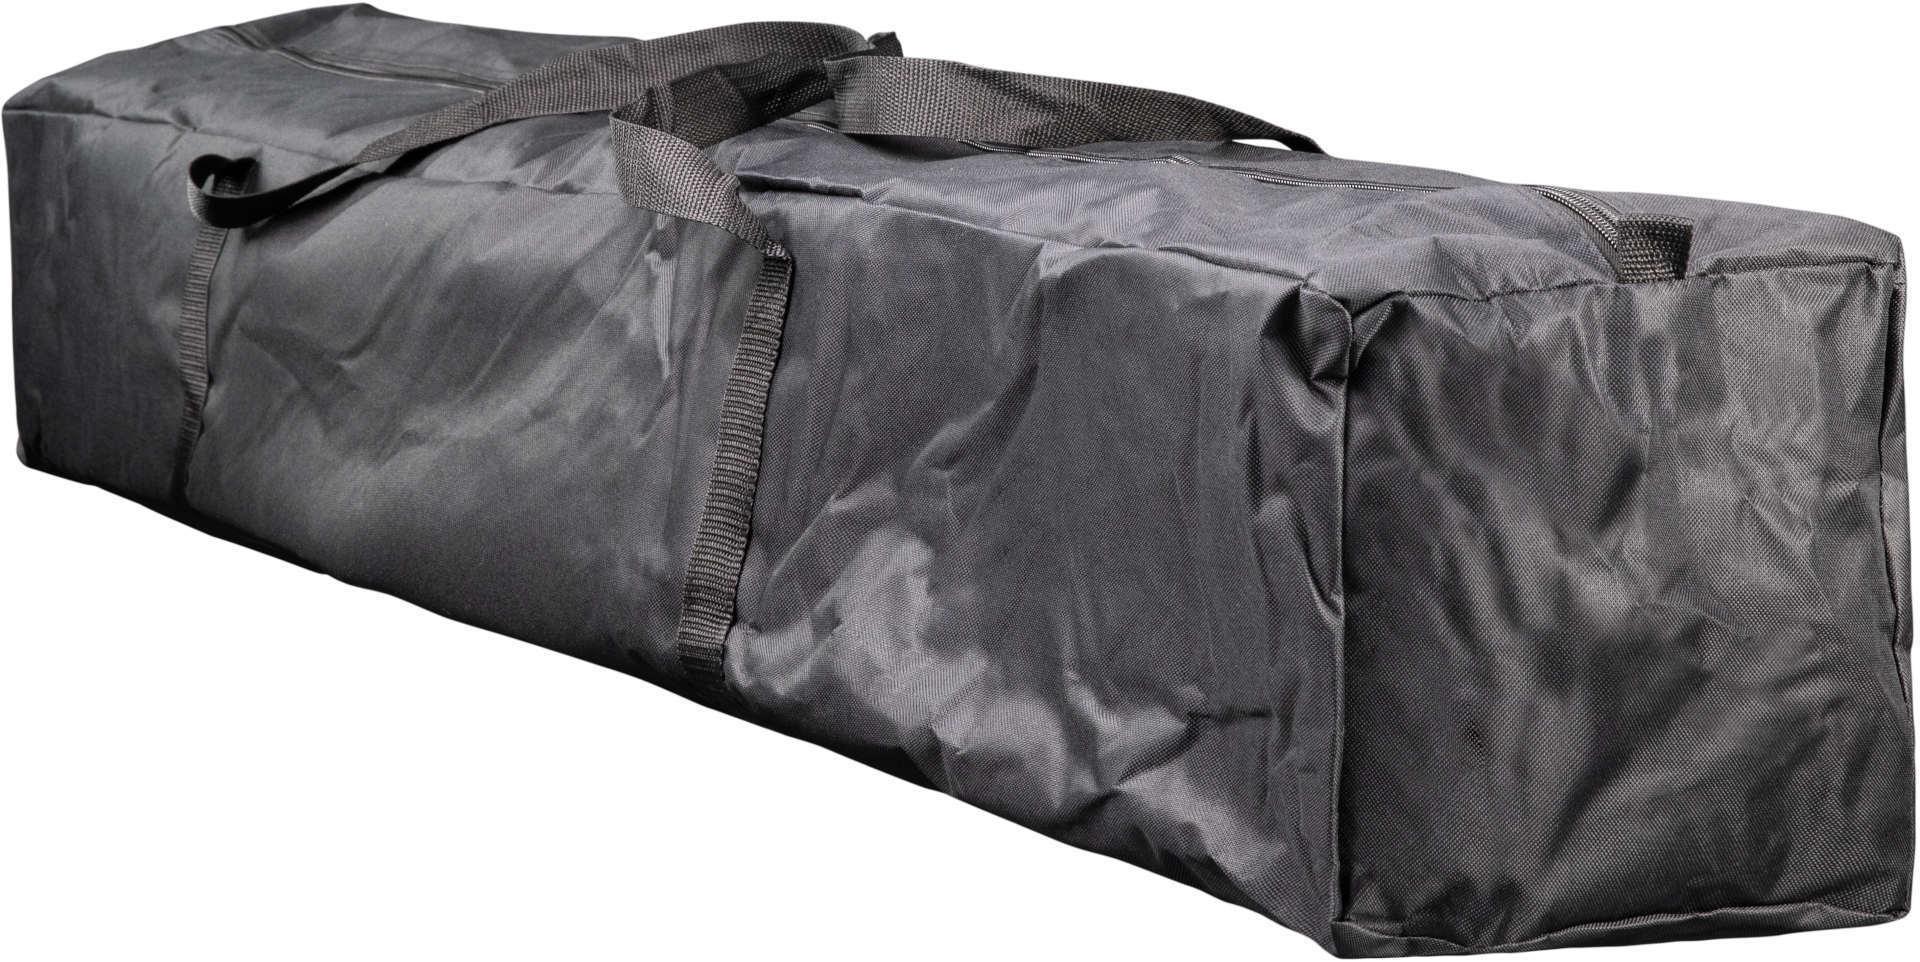 FC-Moto Tent Bag Black One Size